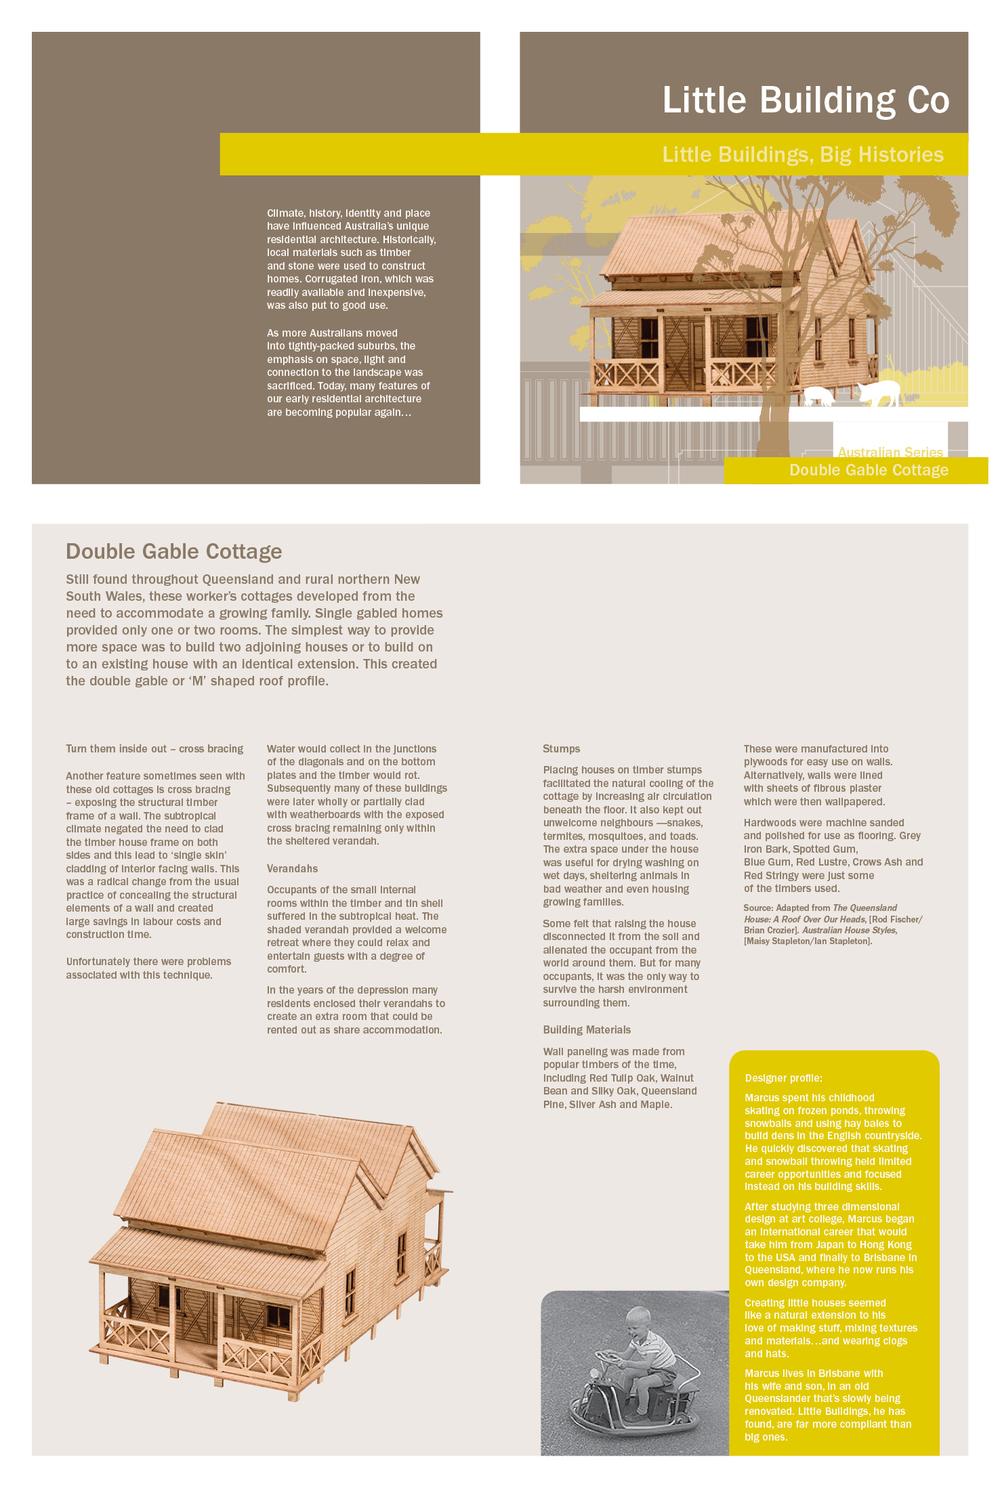 LBco_3 Print Literature.jpg